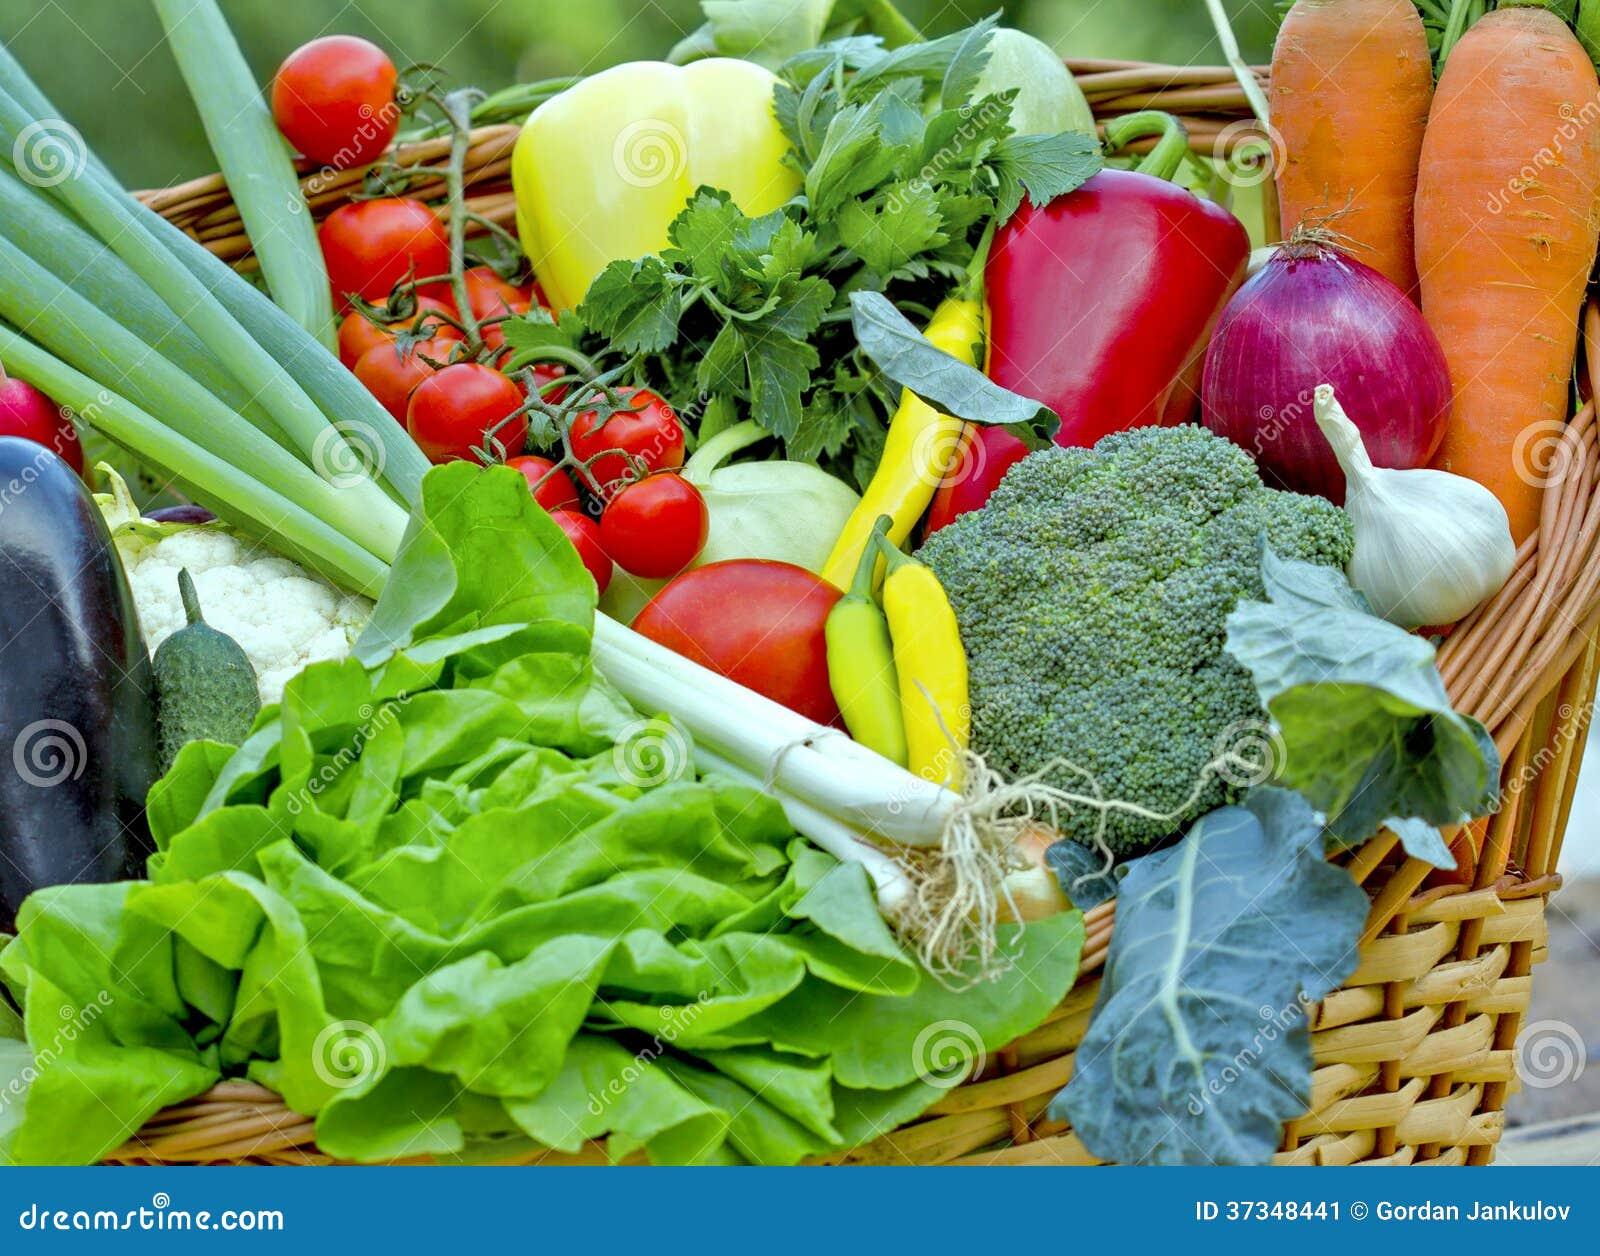 Nya grönsaker i en vide- korg